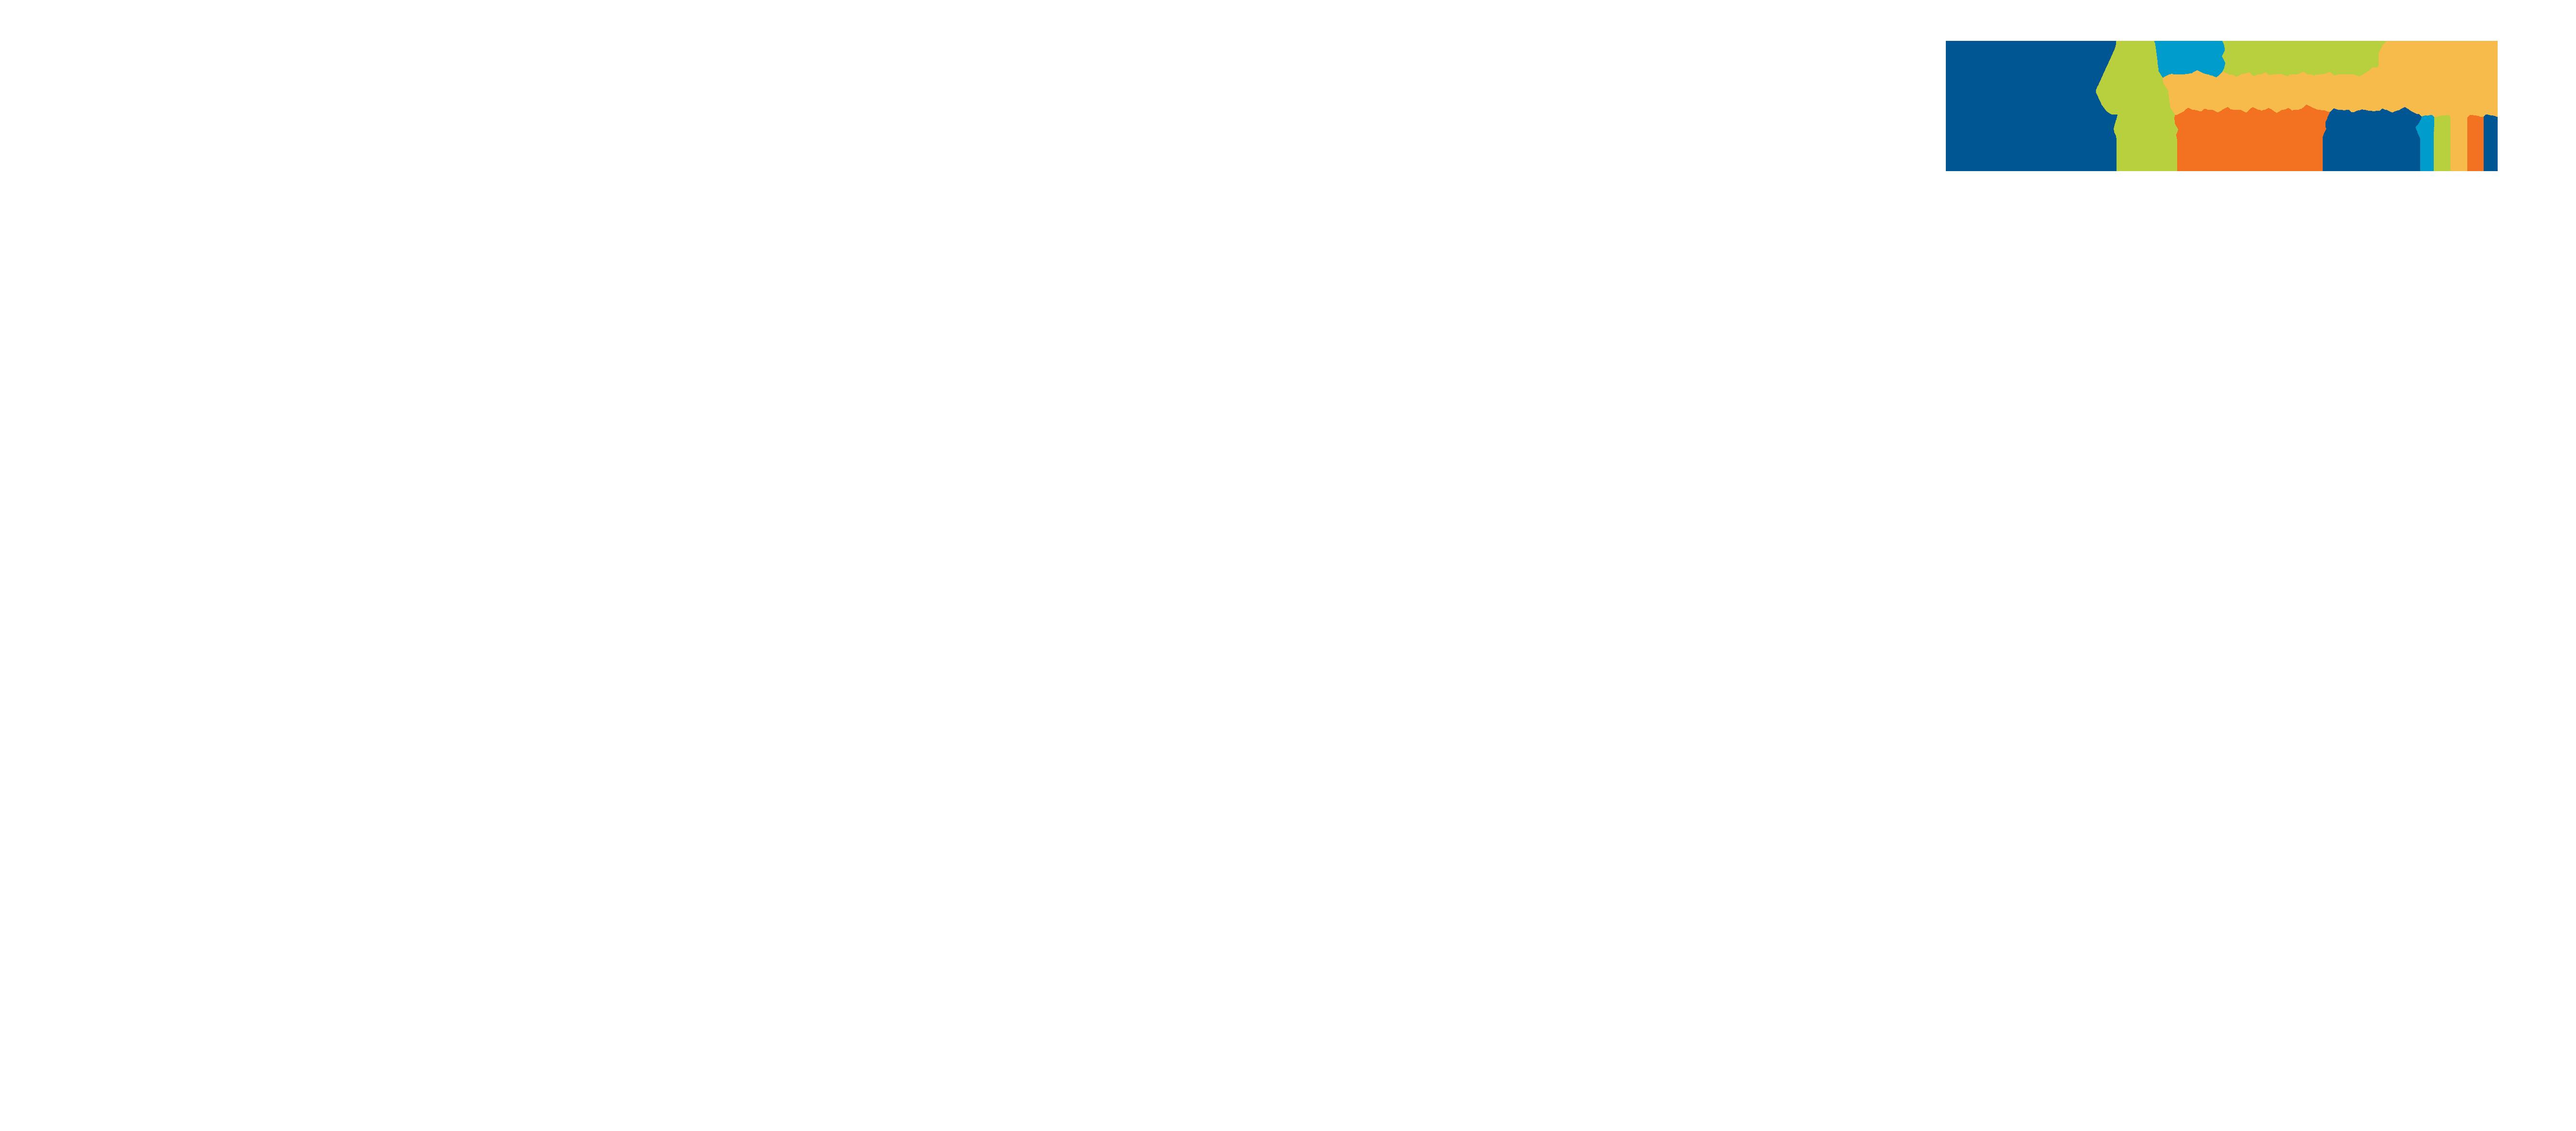 2018 IDC数字化转型年度盛典暨第三届中国数字化转型领军用户颁奖典礼